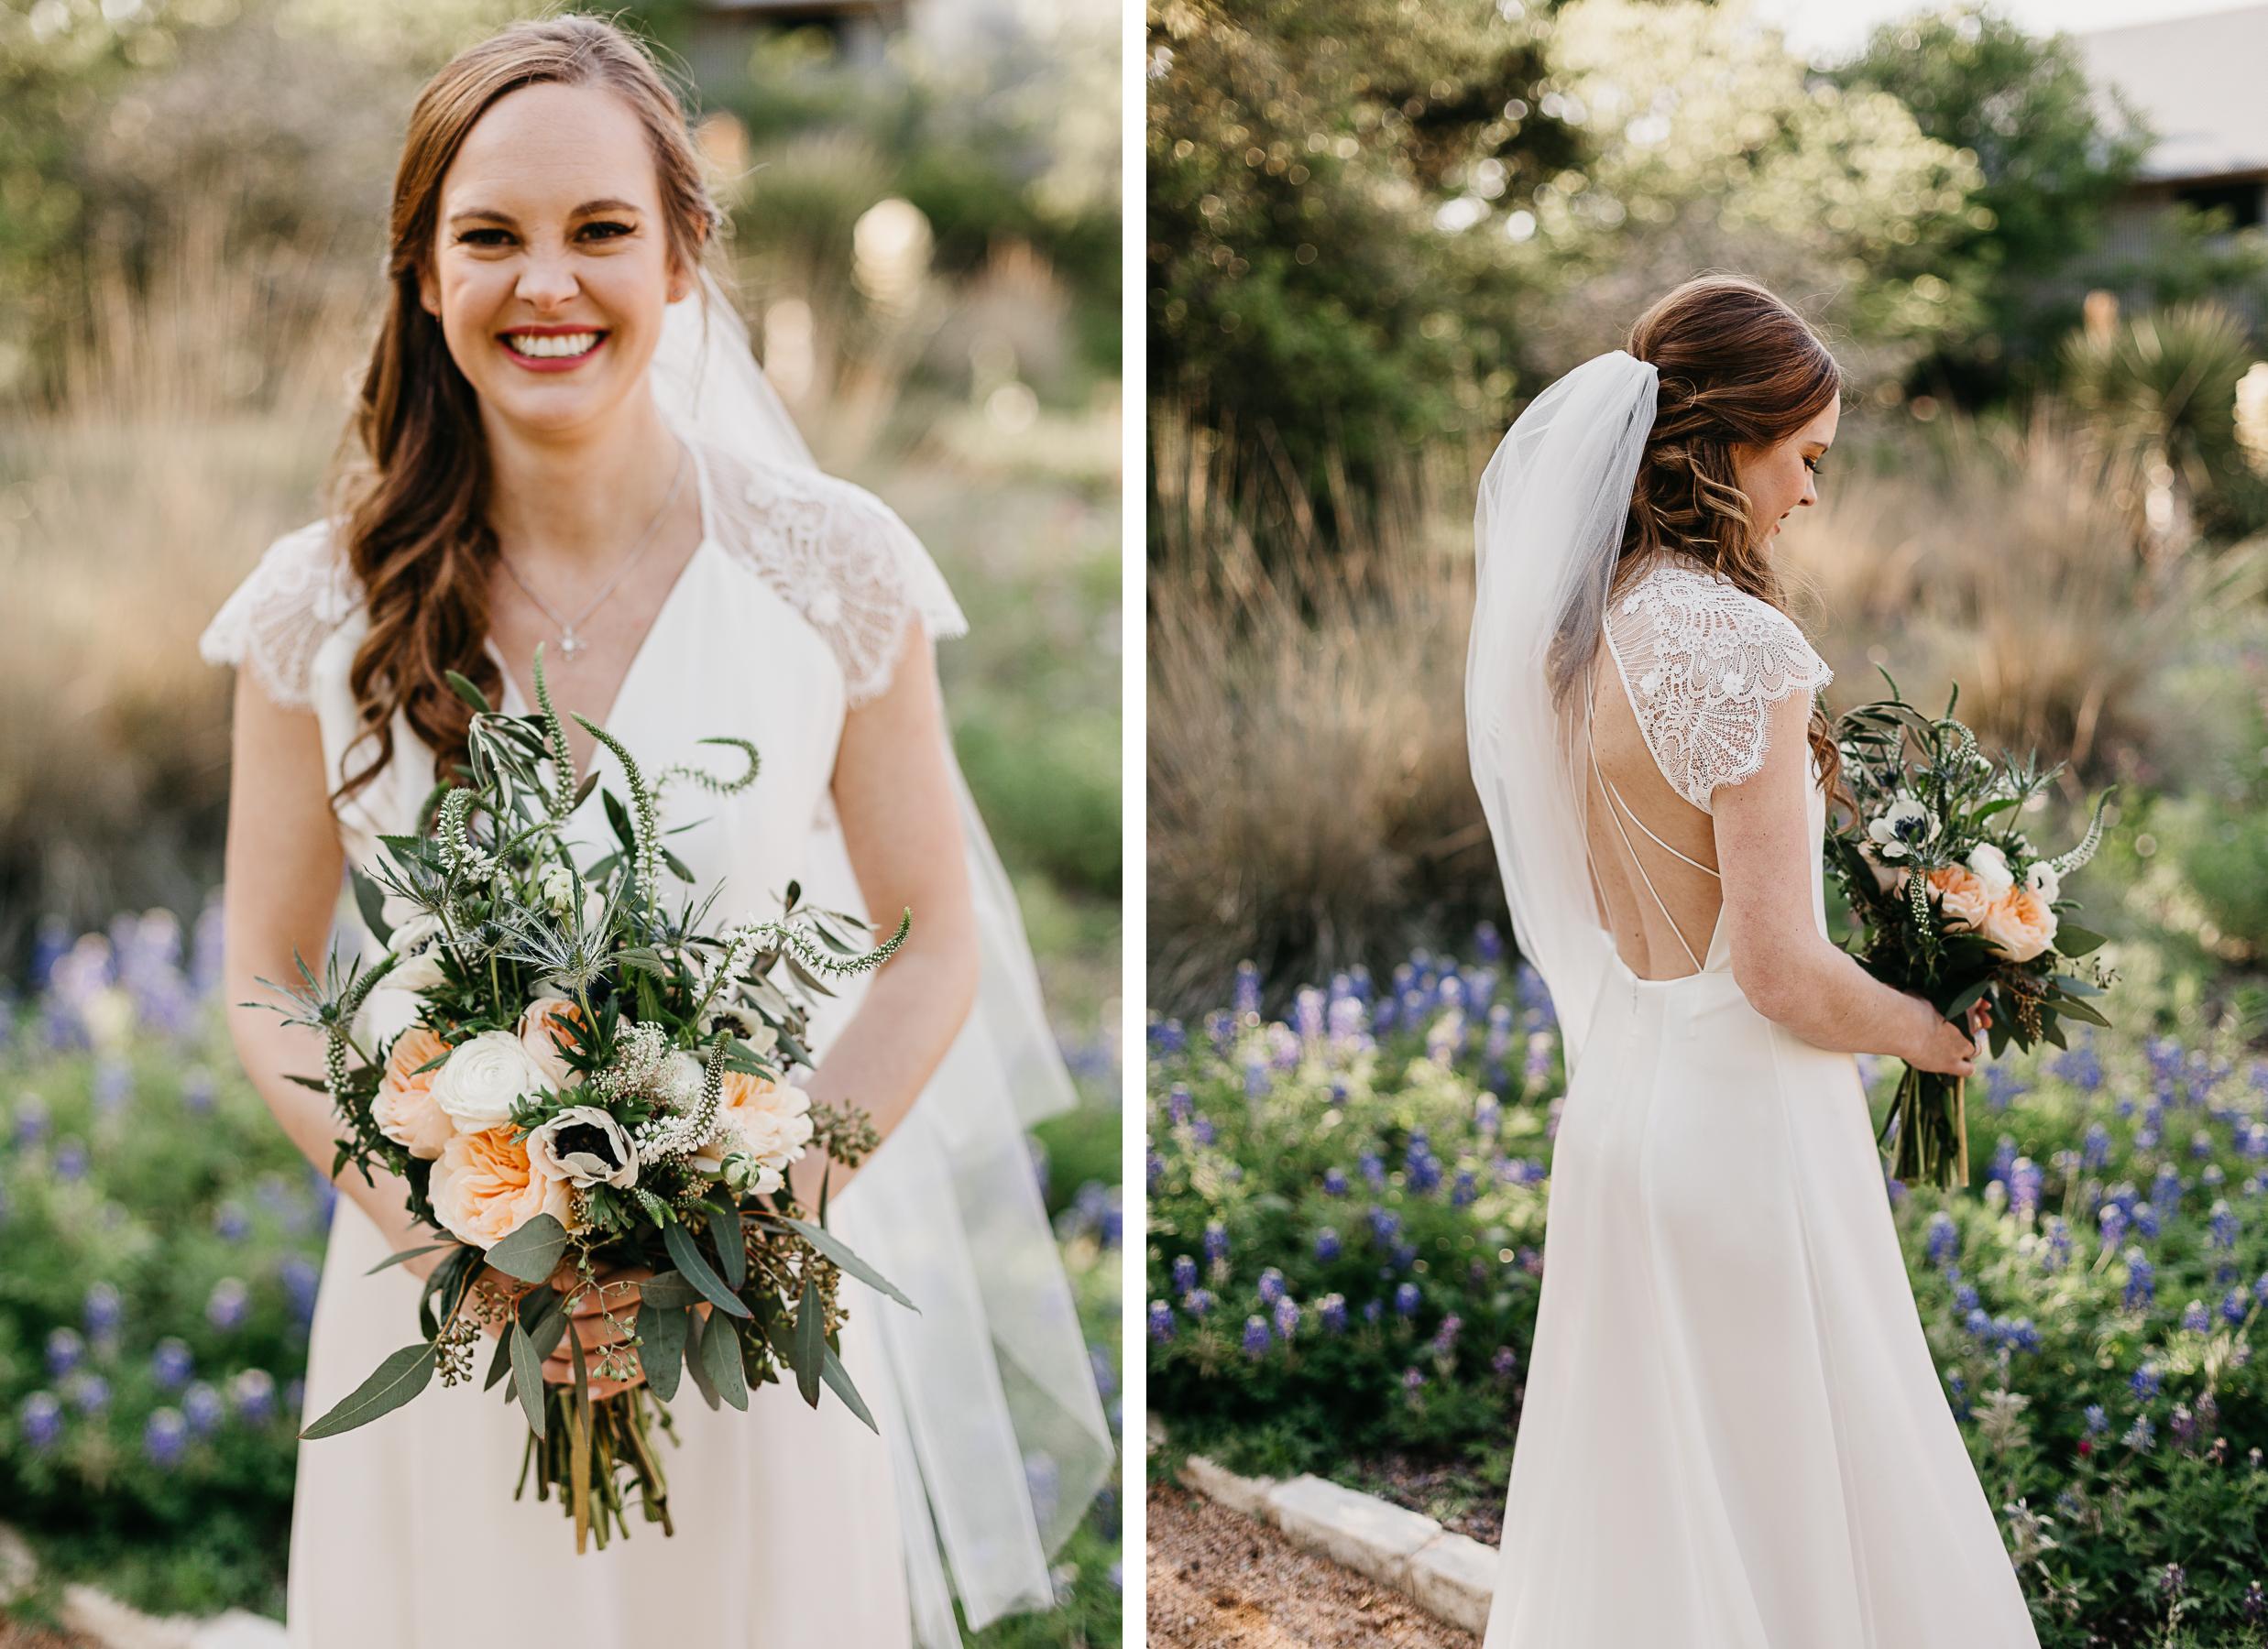 Austin Wedding Photographer Lady Bird Johnson Wildflower Center Wedding 5.jpg